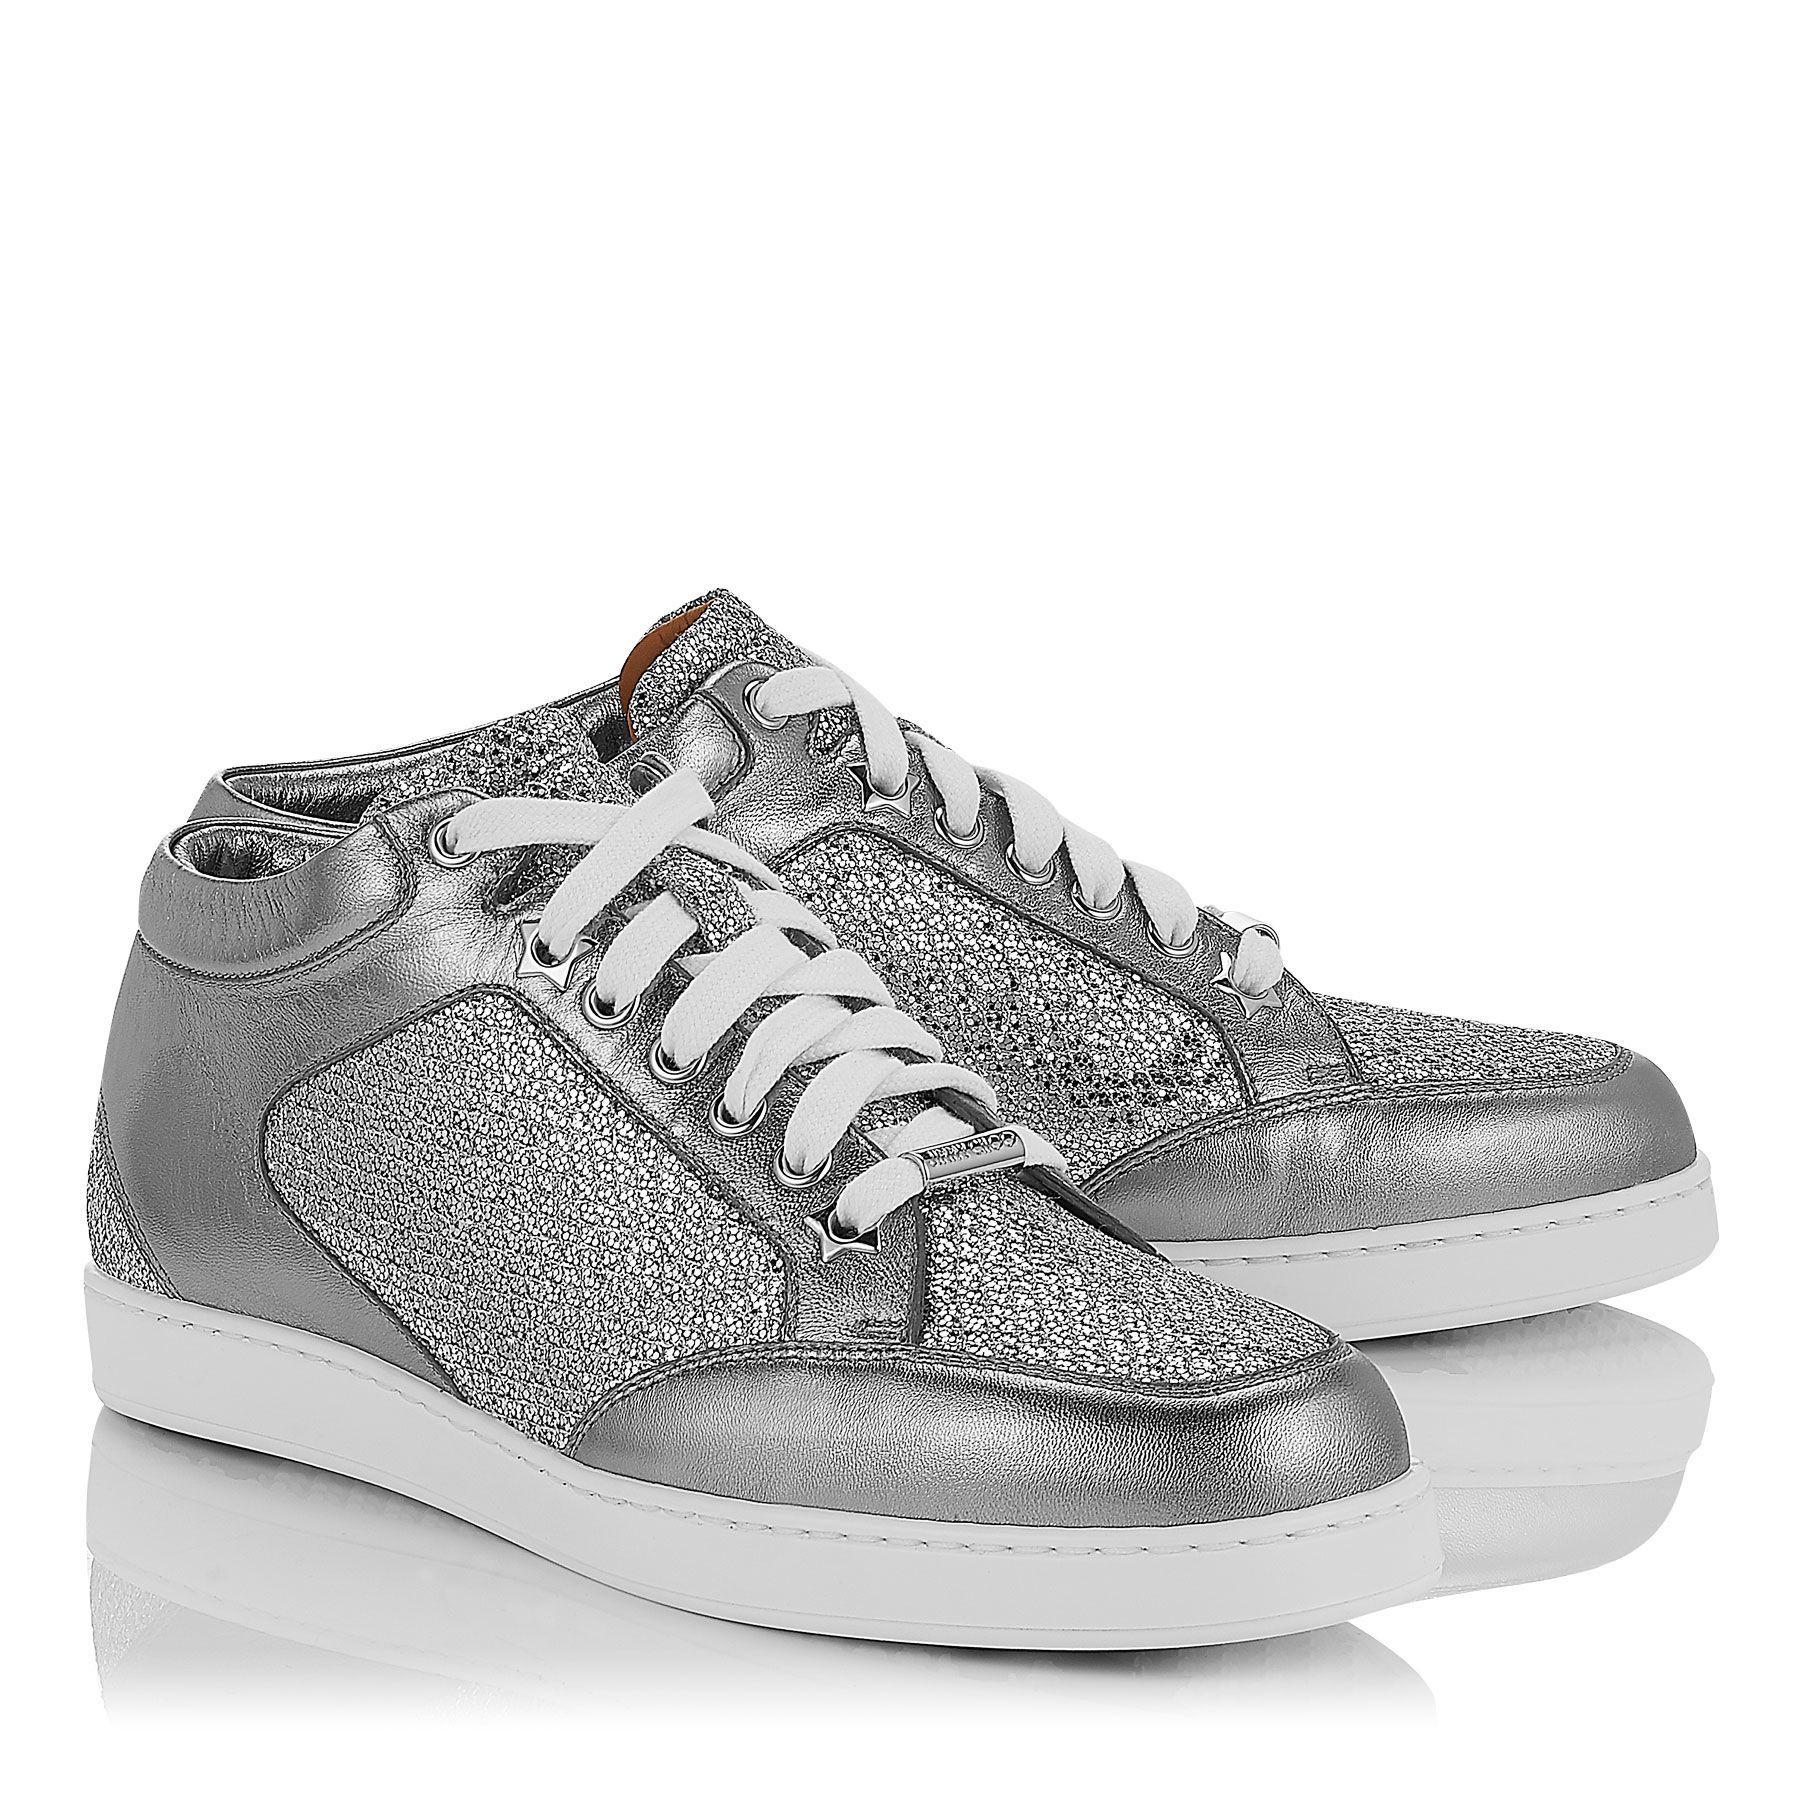 Jimmy choo, Casual shoes, Glitter fabric